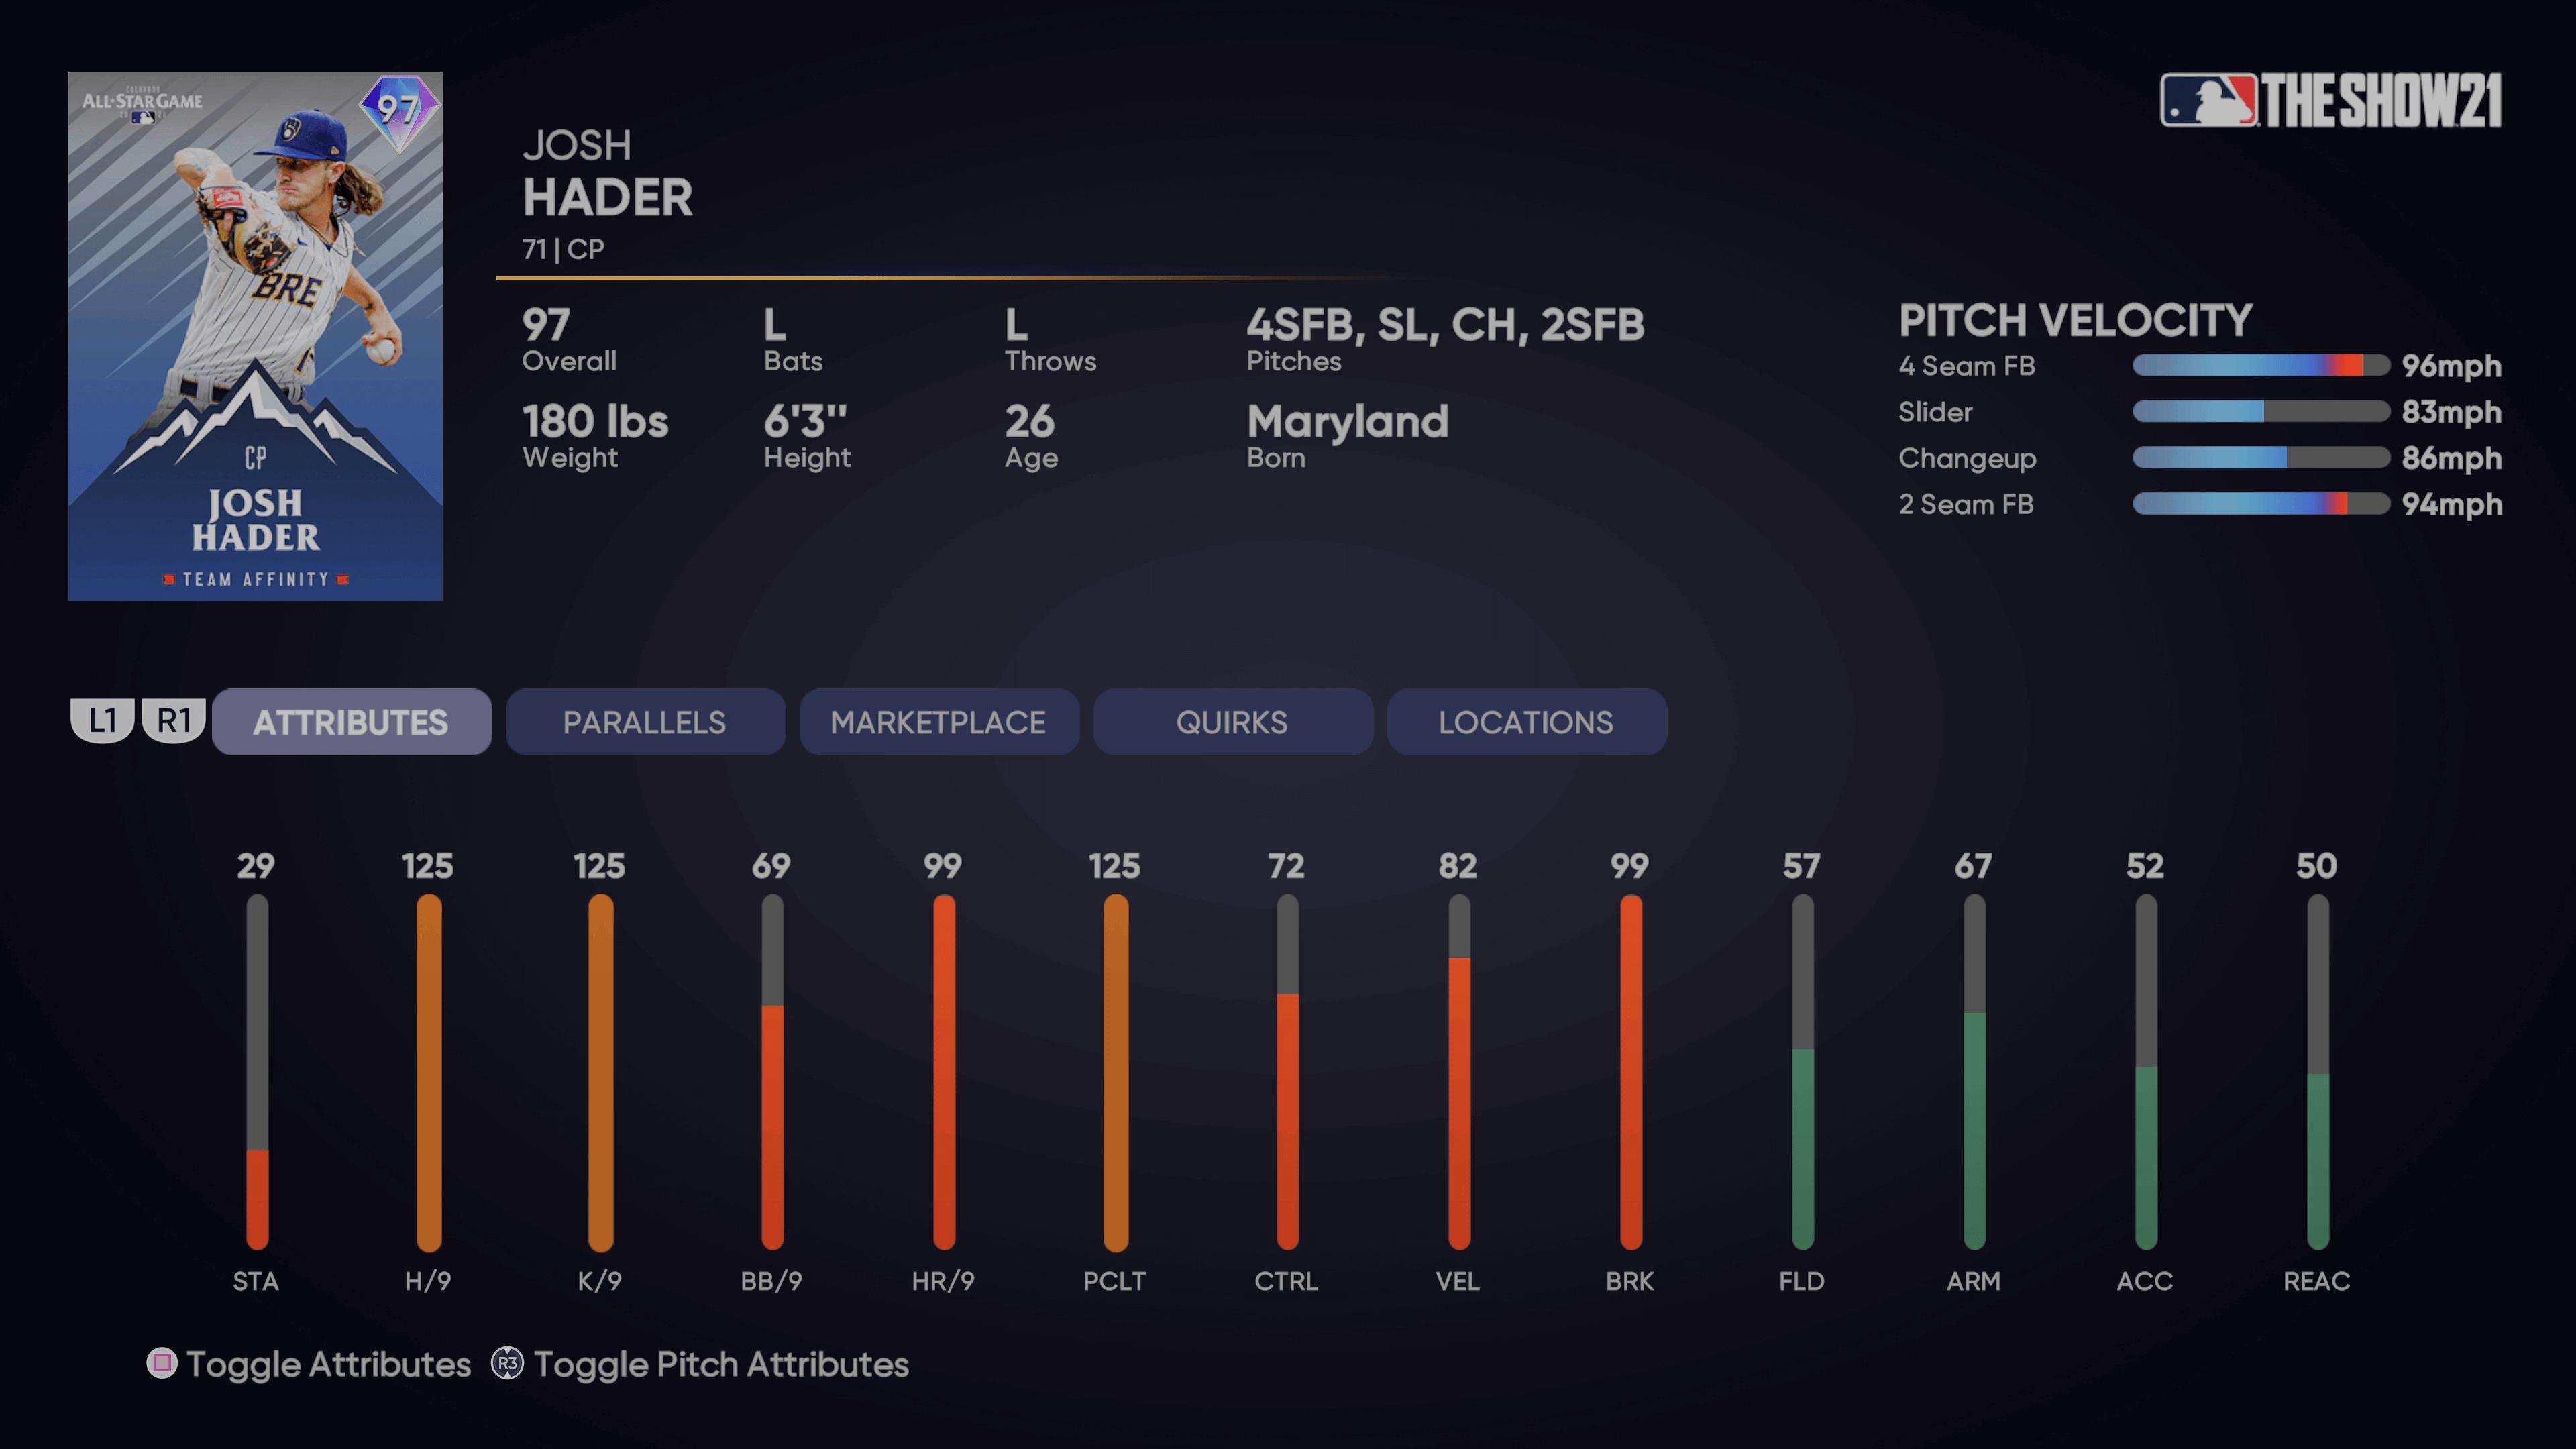 MLB The Show 21 - Team Affinity Season 3_2021-07-12_15-18-41